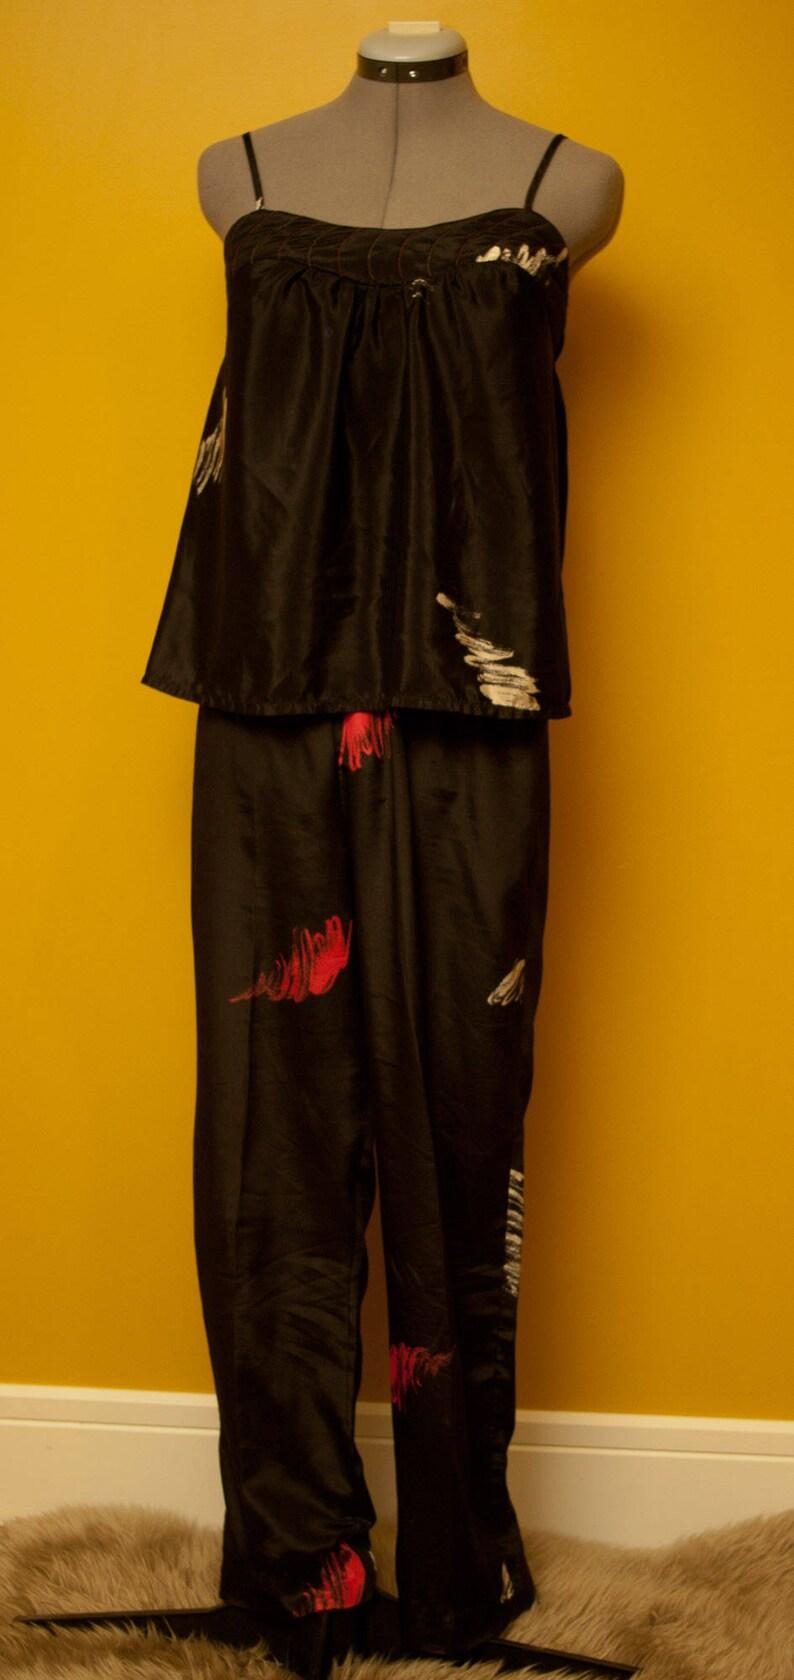 Mahogany Montreal 3 Piece Pajama Set Size SmallMed Vintage Kimono Style Sleep Set